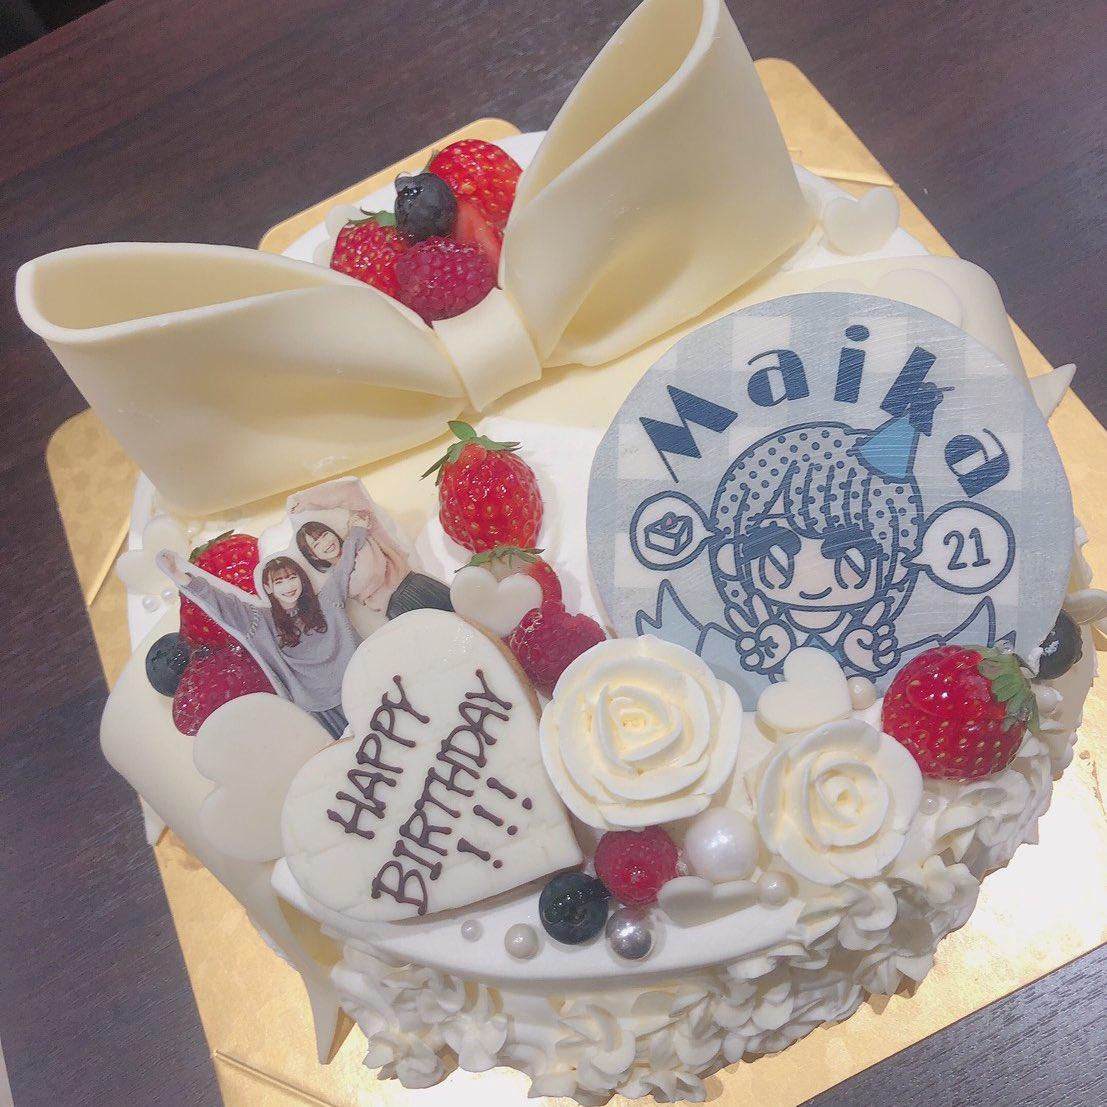 @sasaki_maika's photo on Hinata